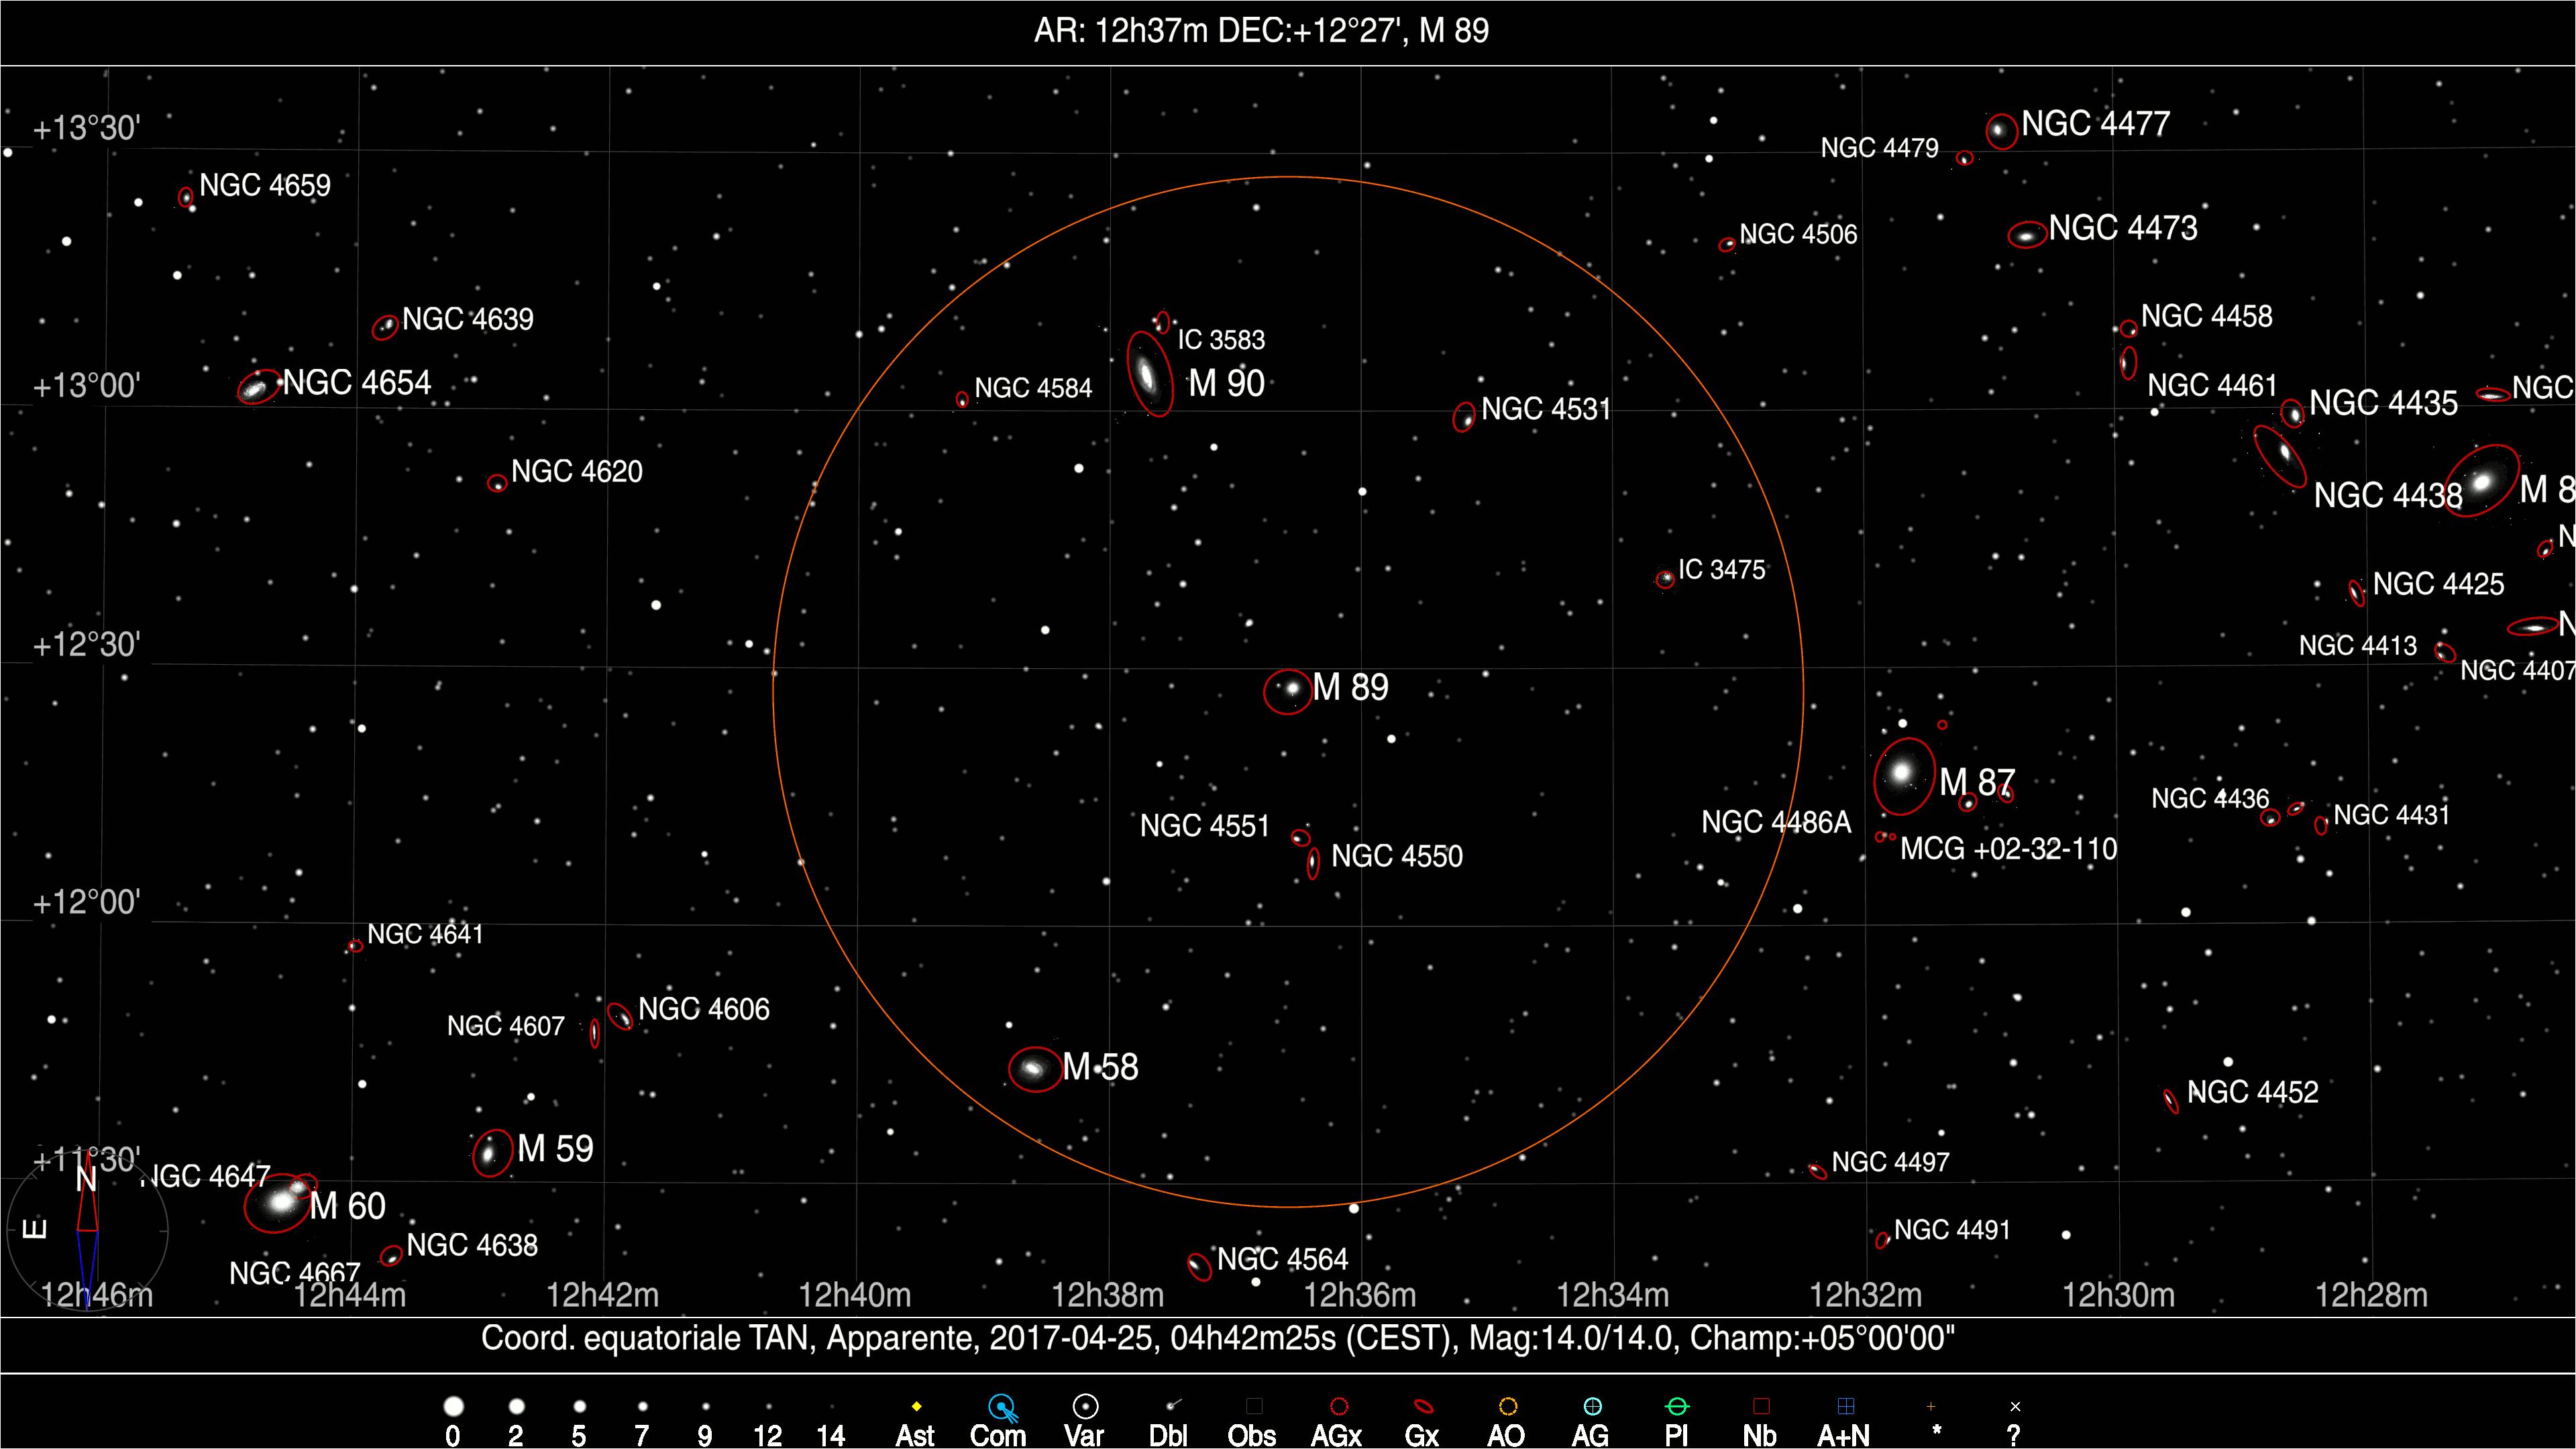 M89_5